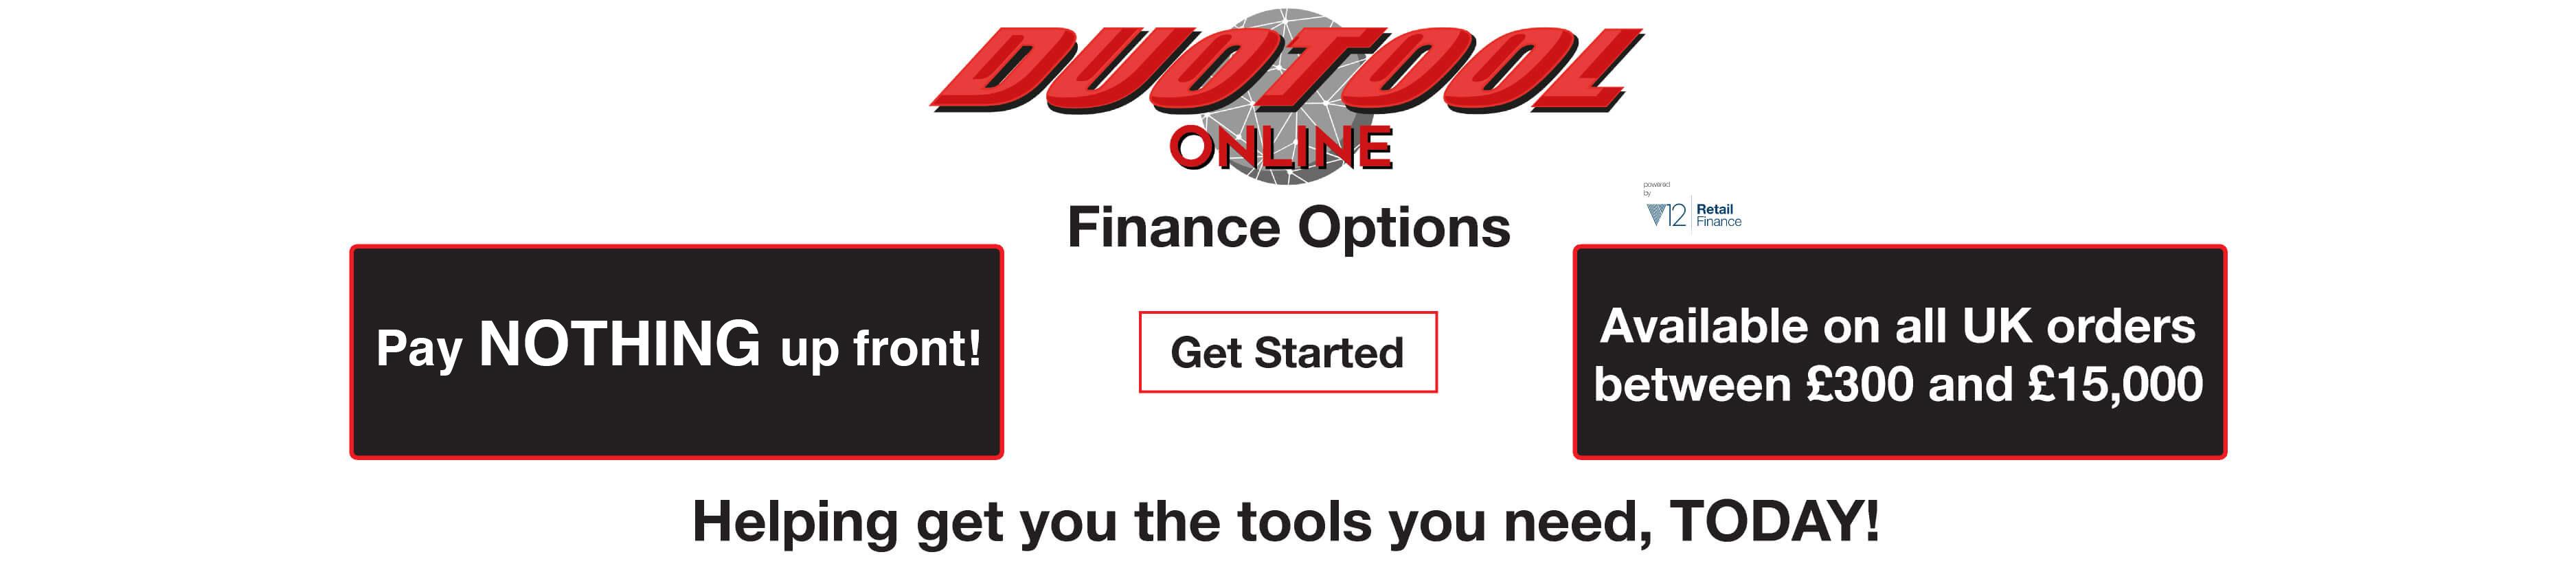 Duotool Finance